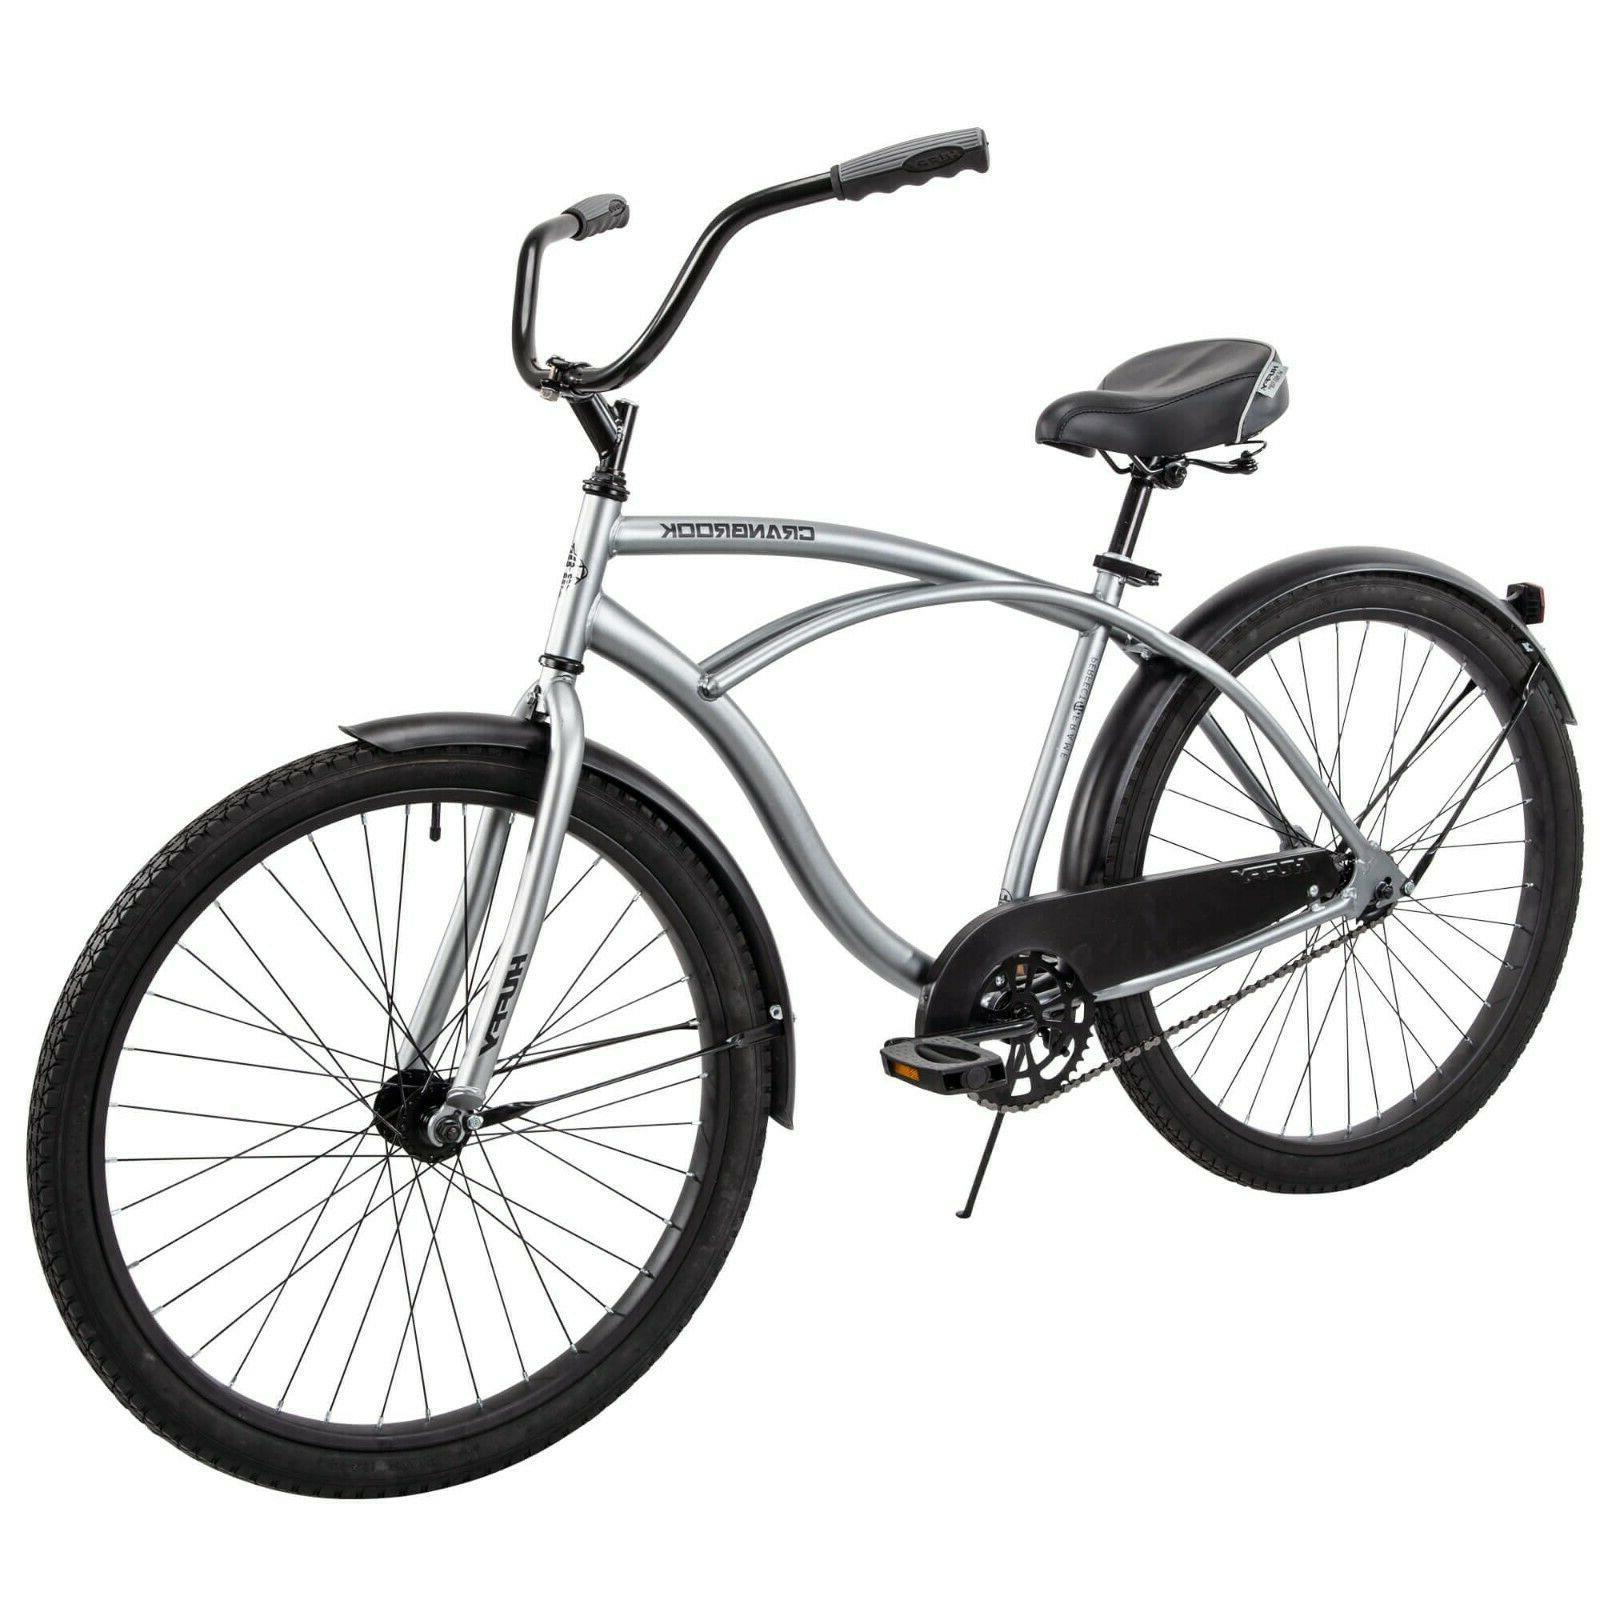 "Silver Huffy 26/"" Cranbrook Men/'s Beach Cruiser Comfort Bike"